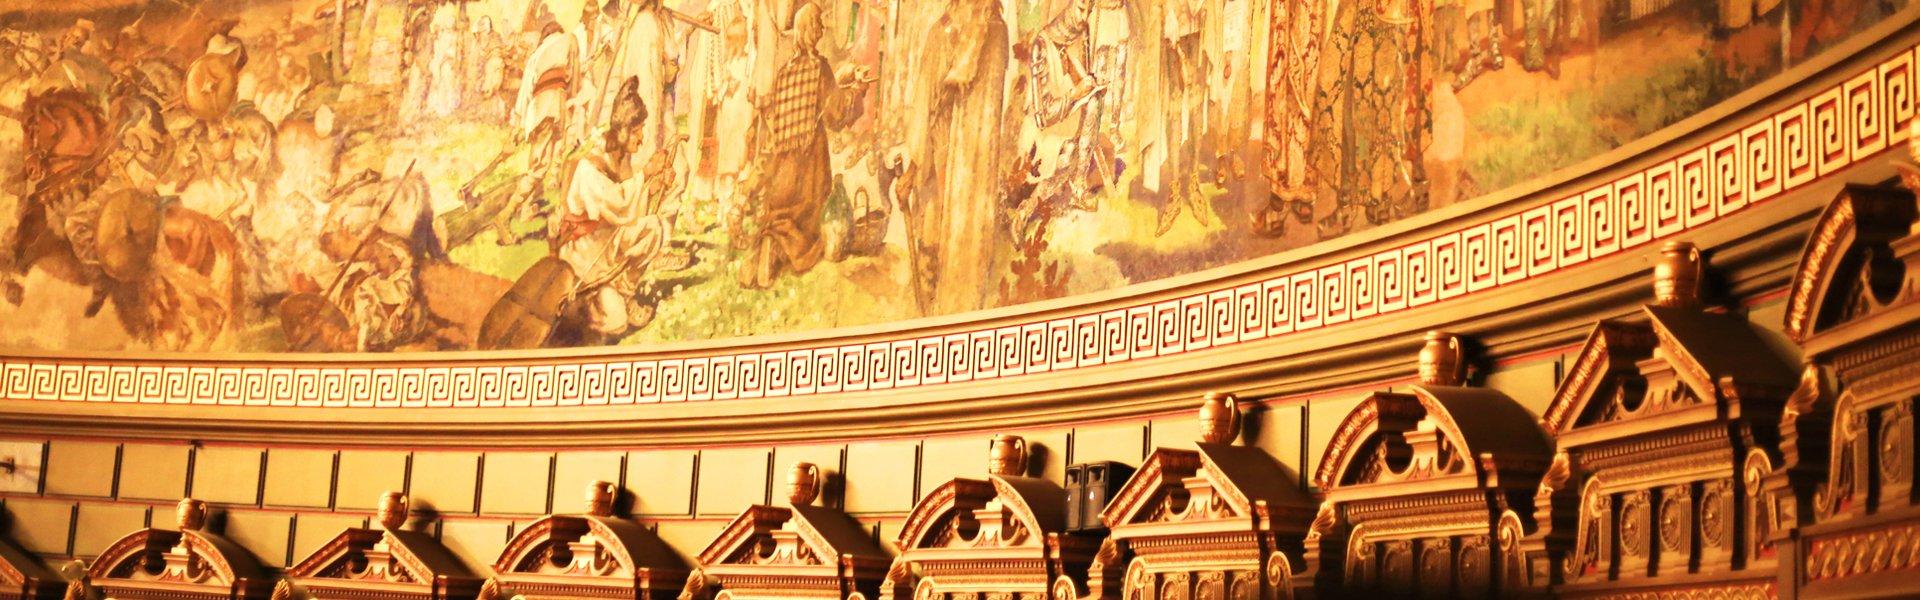 Operagebouw in Boekarest, Roemenië